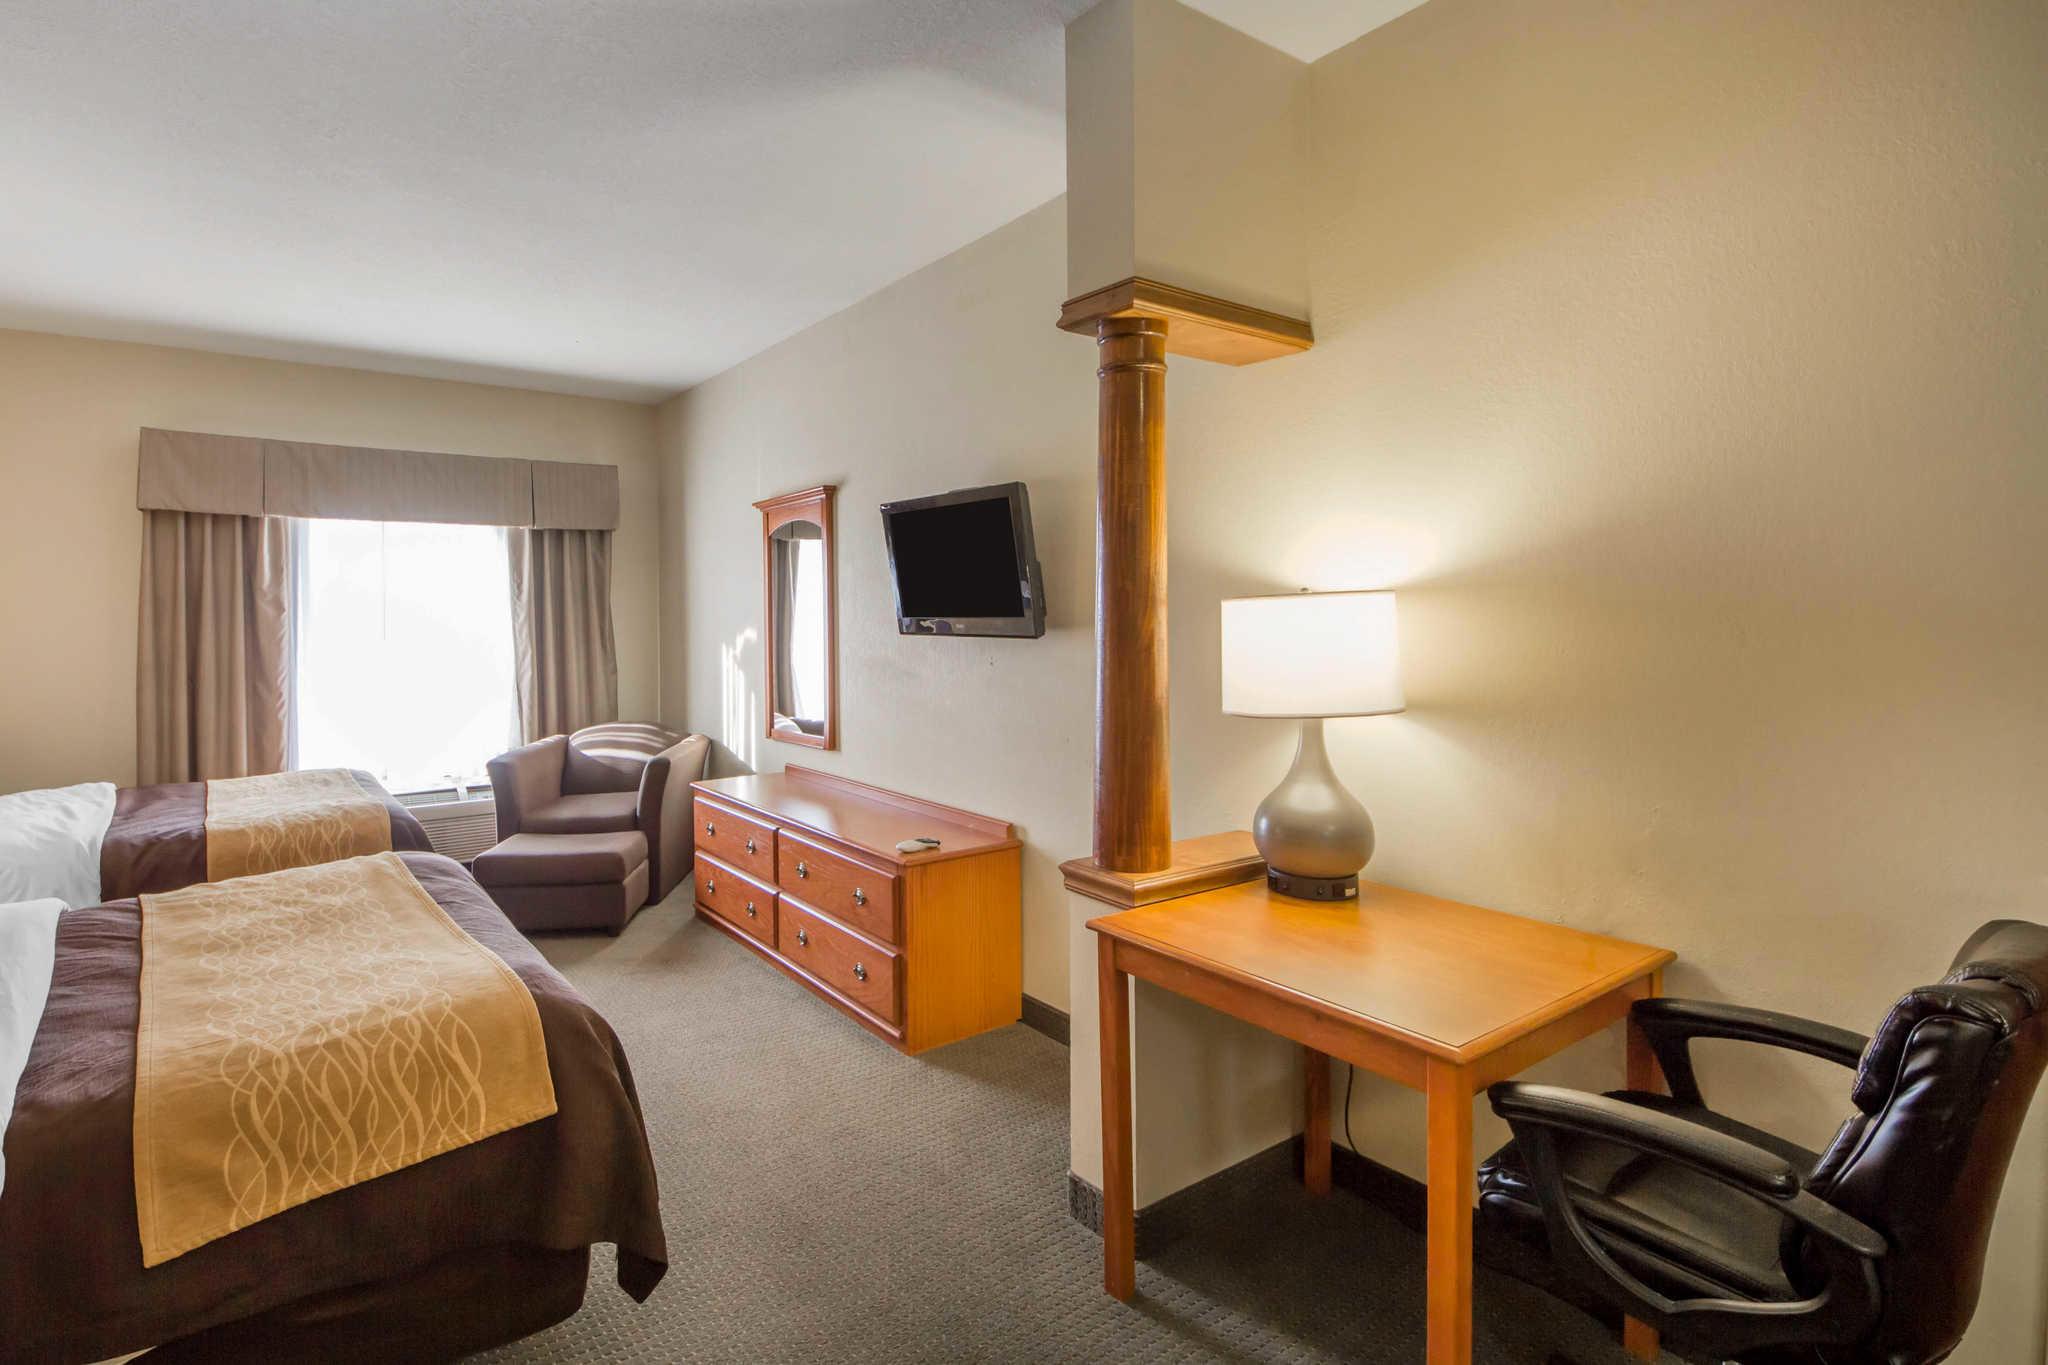 Quality Inn & Suites image 14